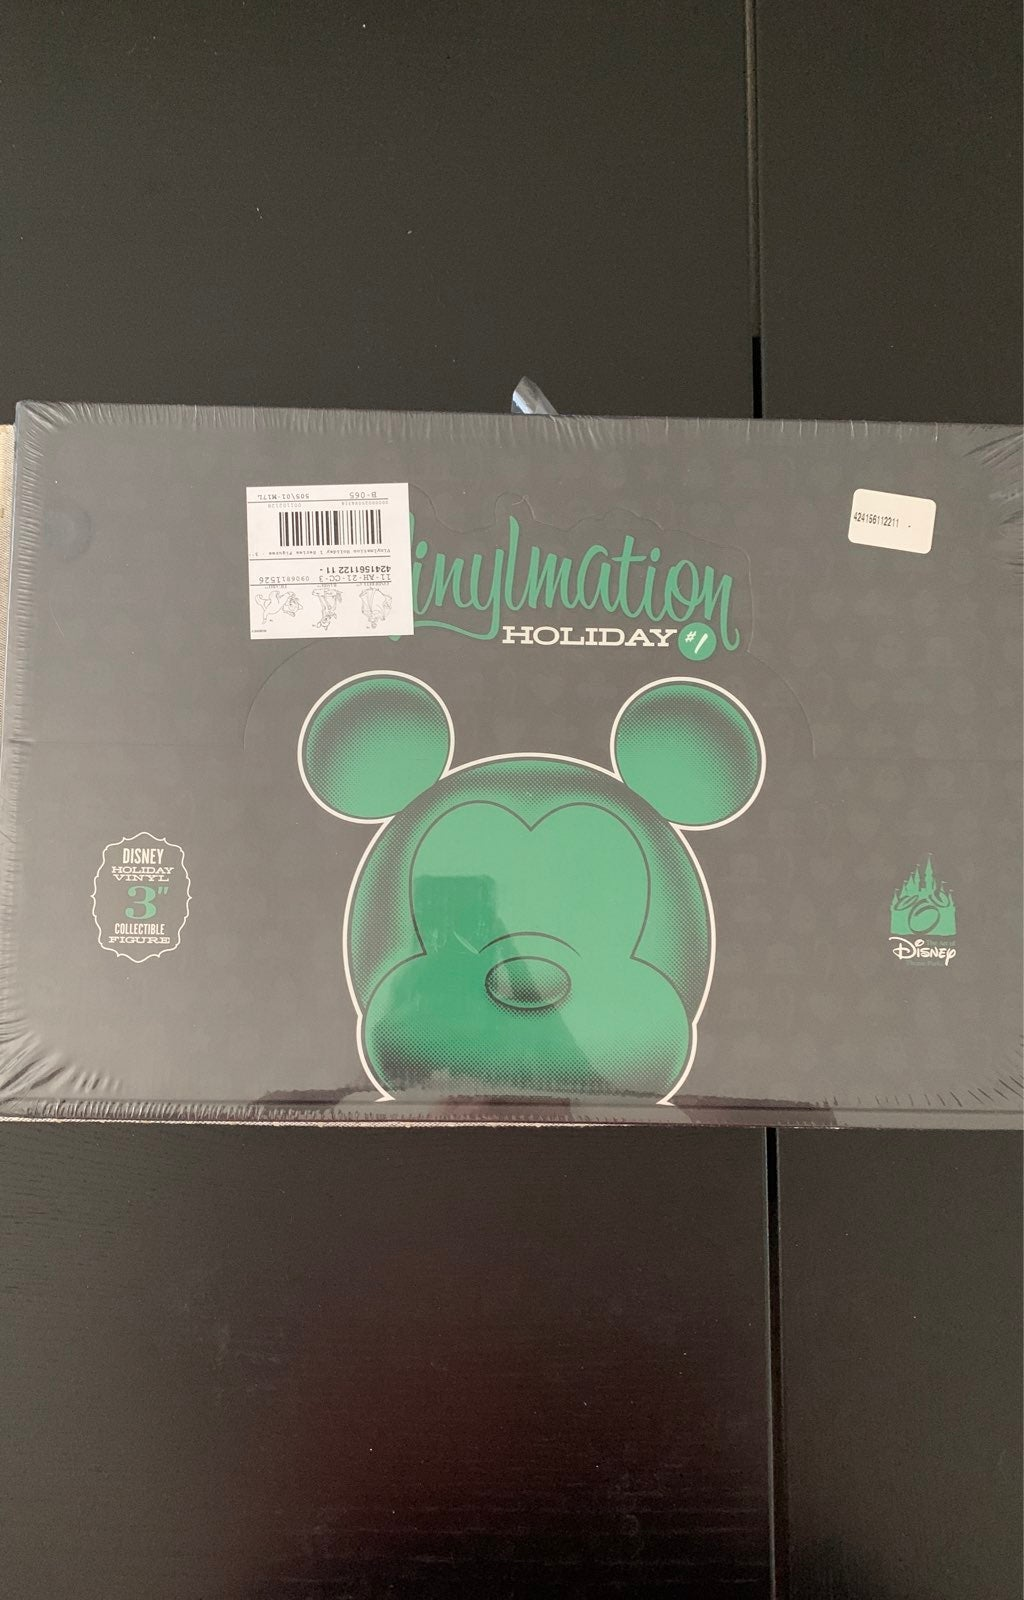 Disney Vinylmation Holiday 1 Tray